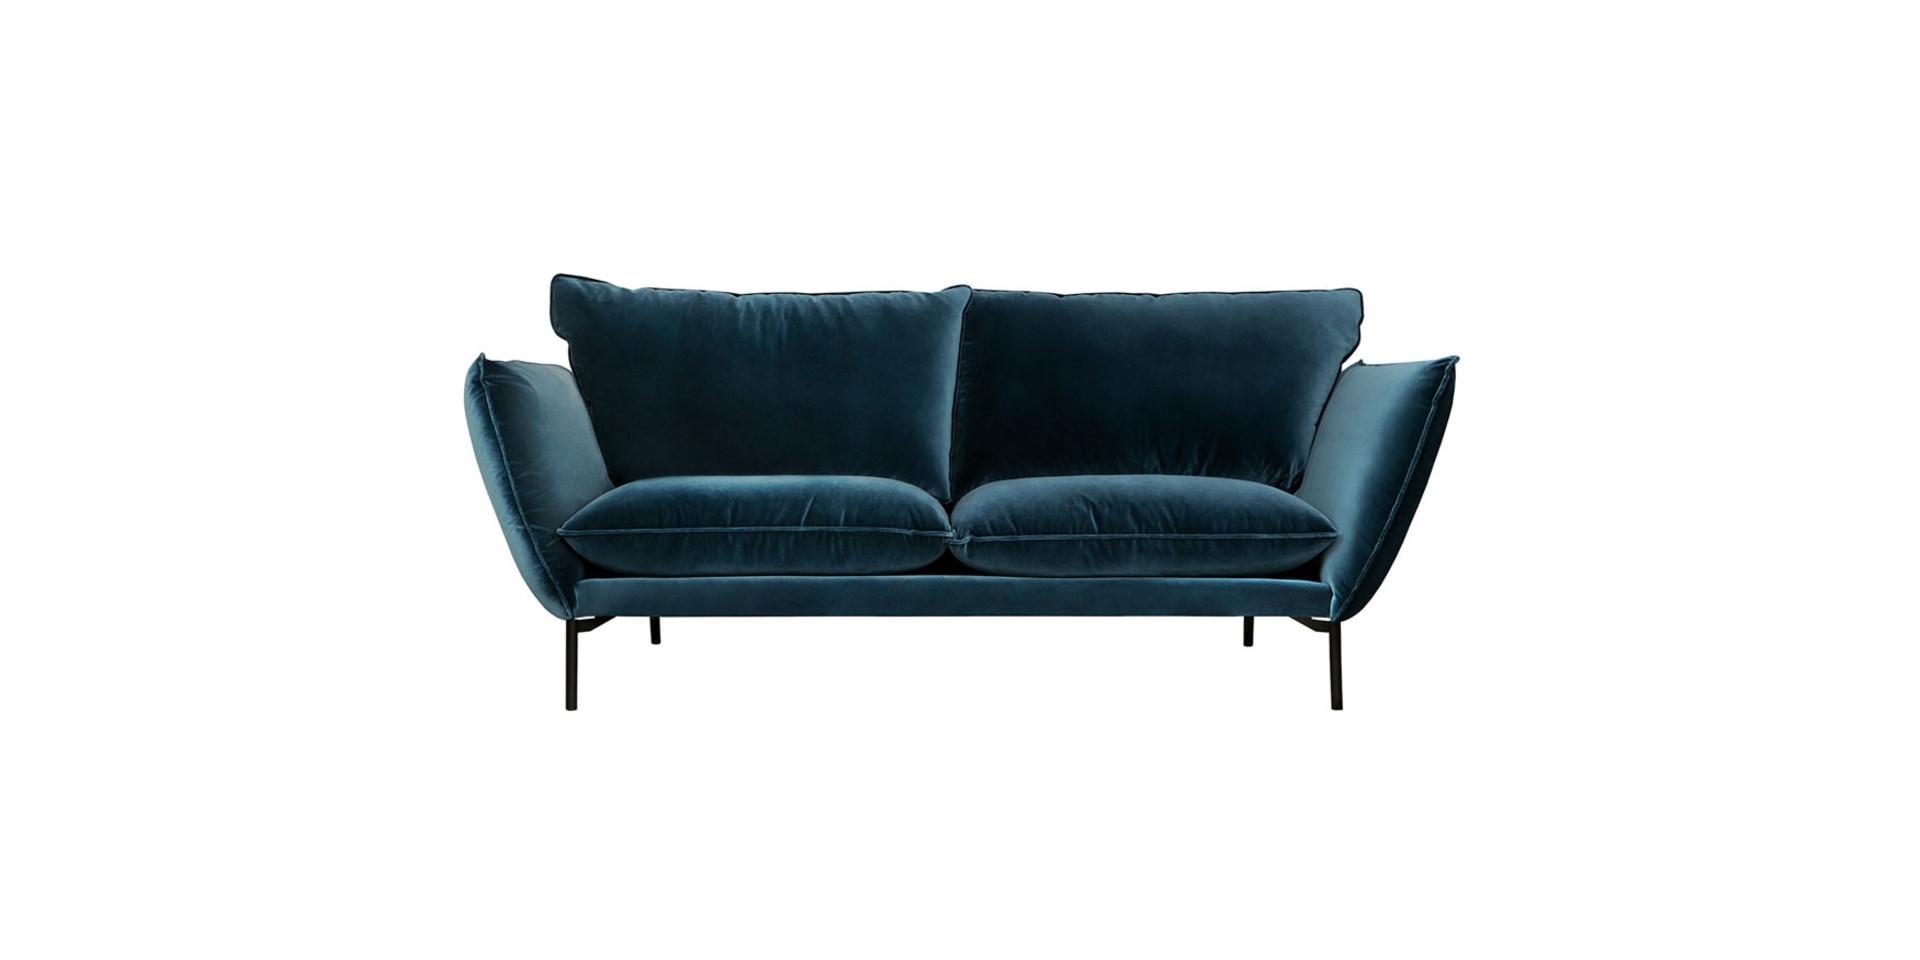 sits-hugo-canape-3seater_lario58_blue_1